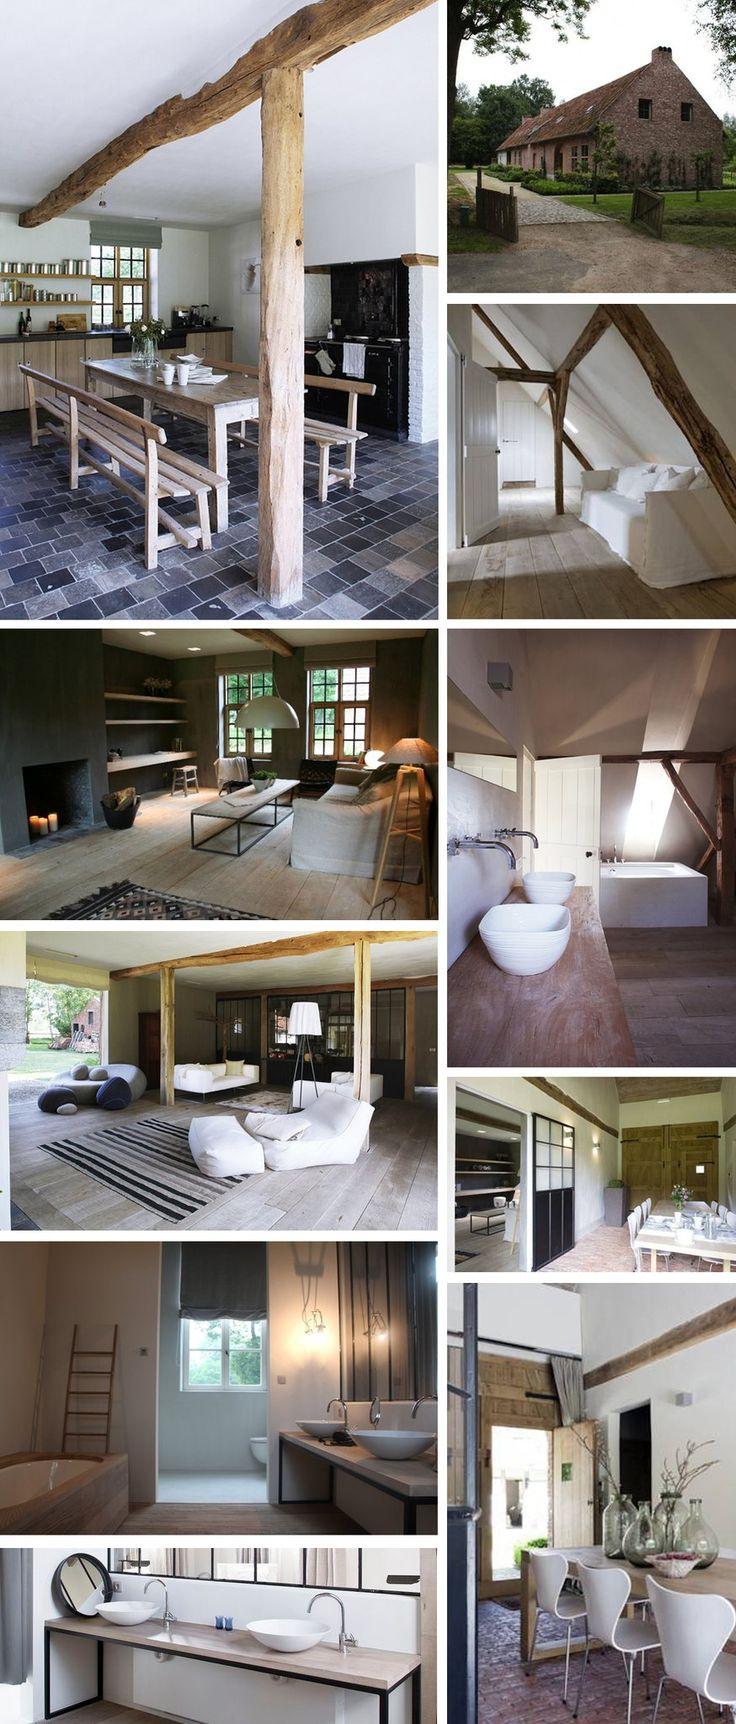 Travel Inspiration : Moka & Vanille in Heusden-Zolder, Belgium – Fawn. Interior Design & Home Decor